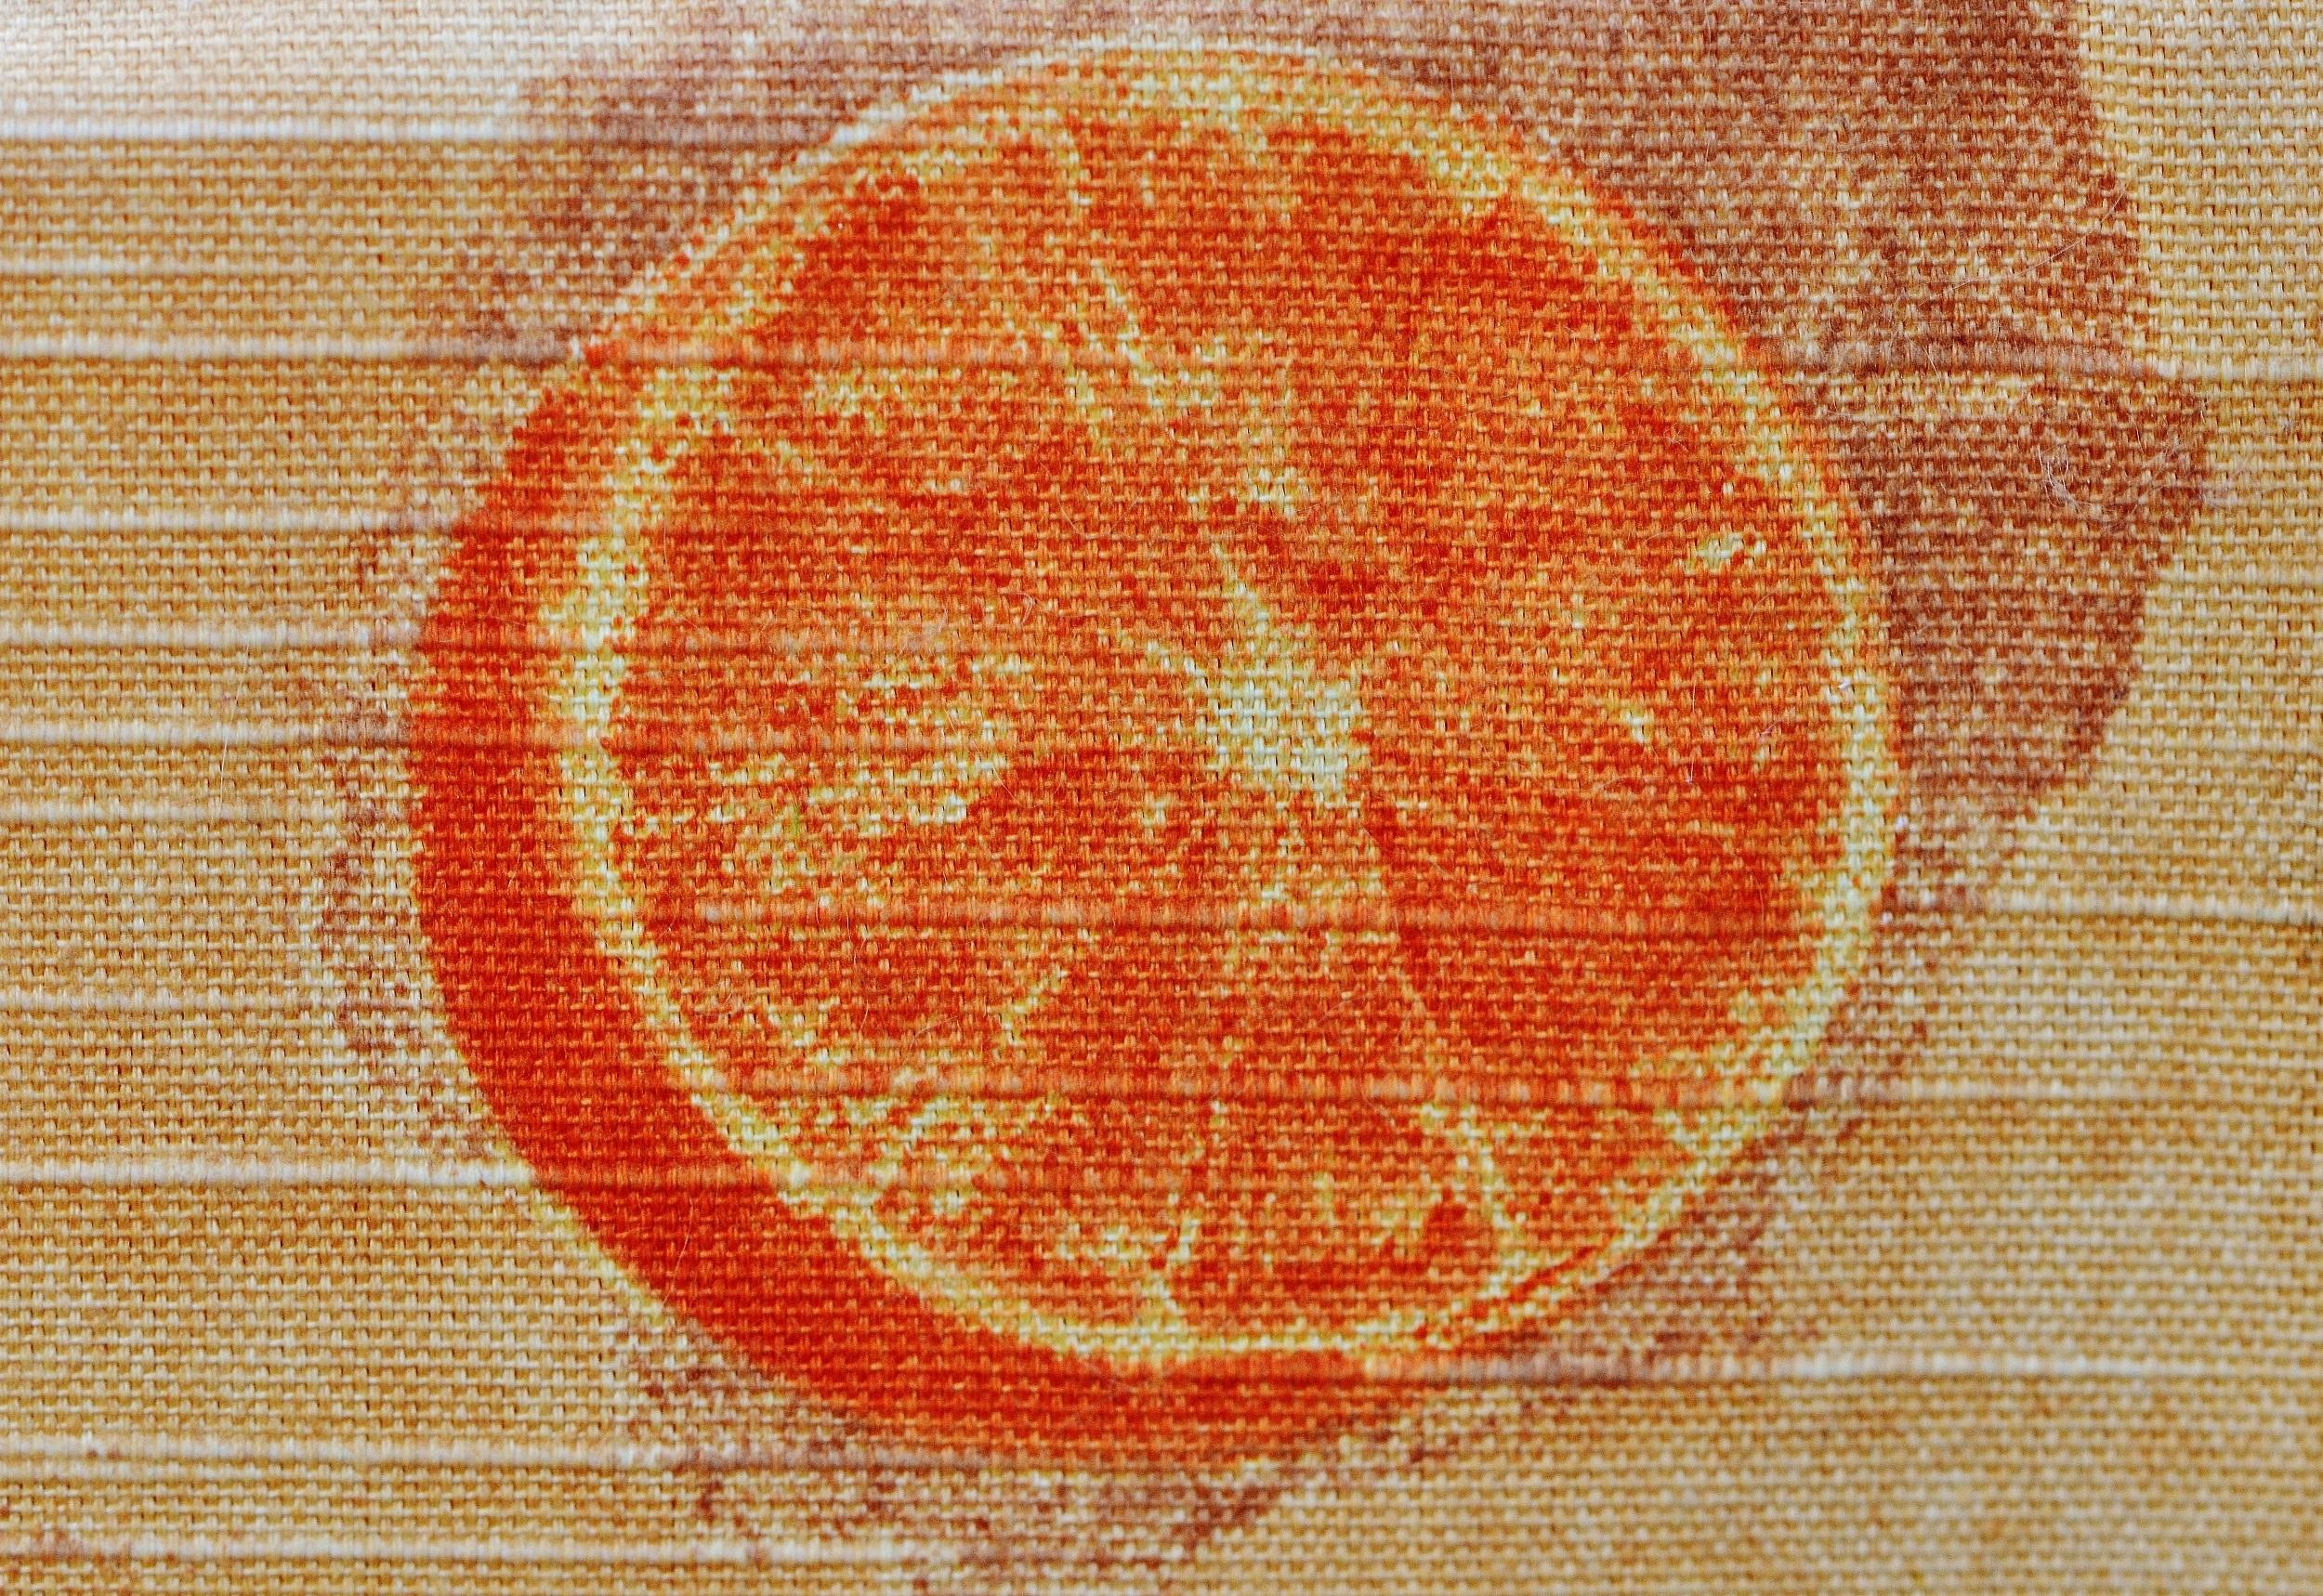 Fotos gratis : estructura, naranja, patrón, cerca, material, circulo ...